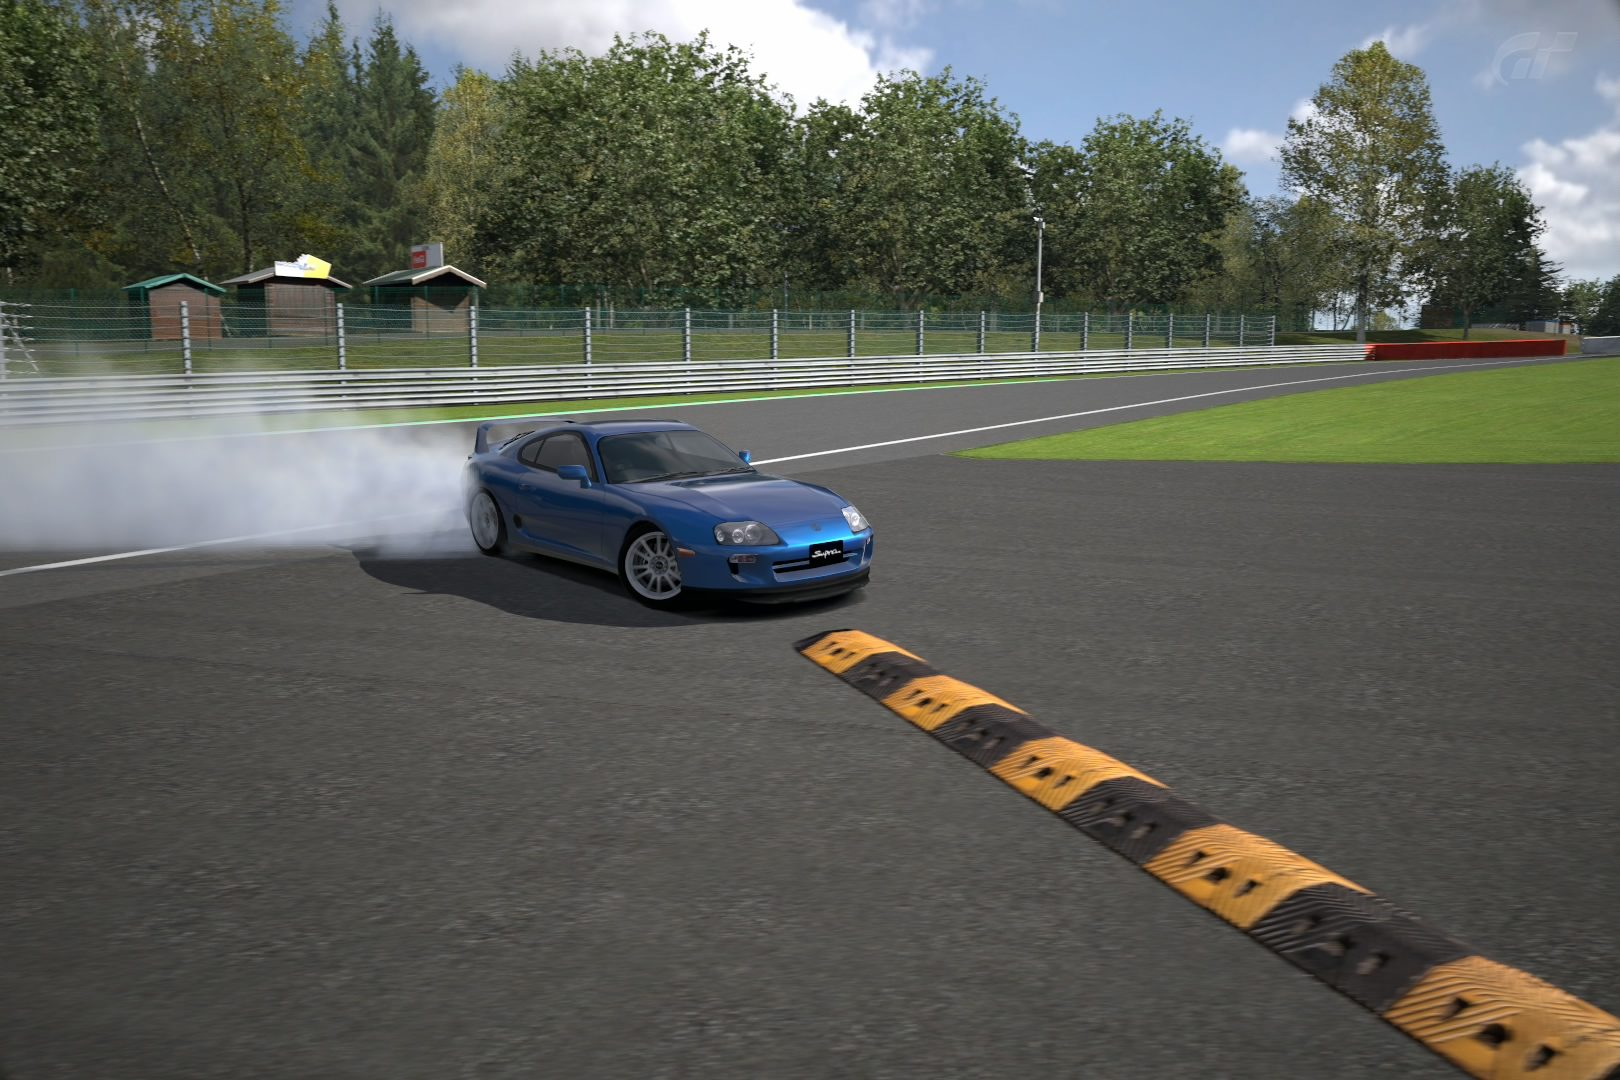 Circuit de Spa-Francorchamps_6.jpg